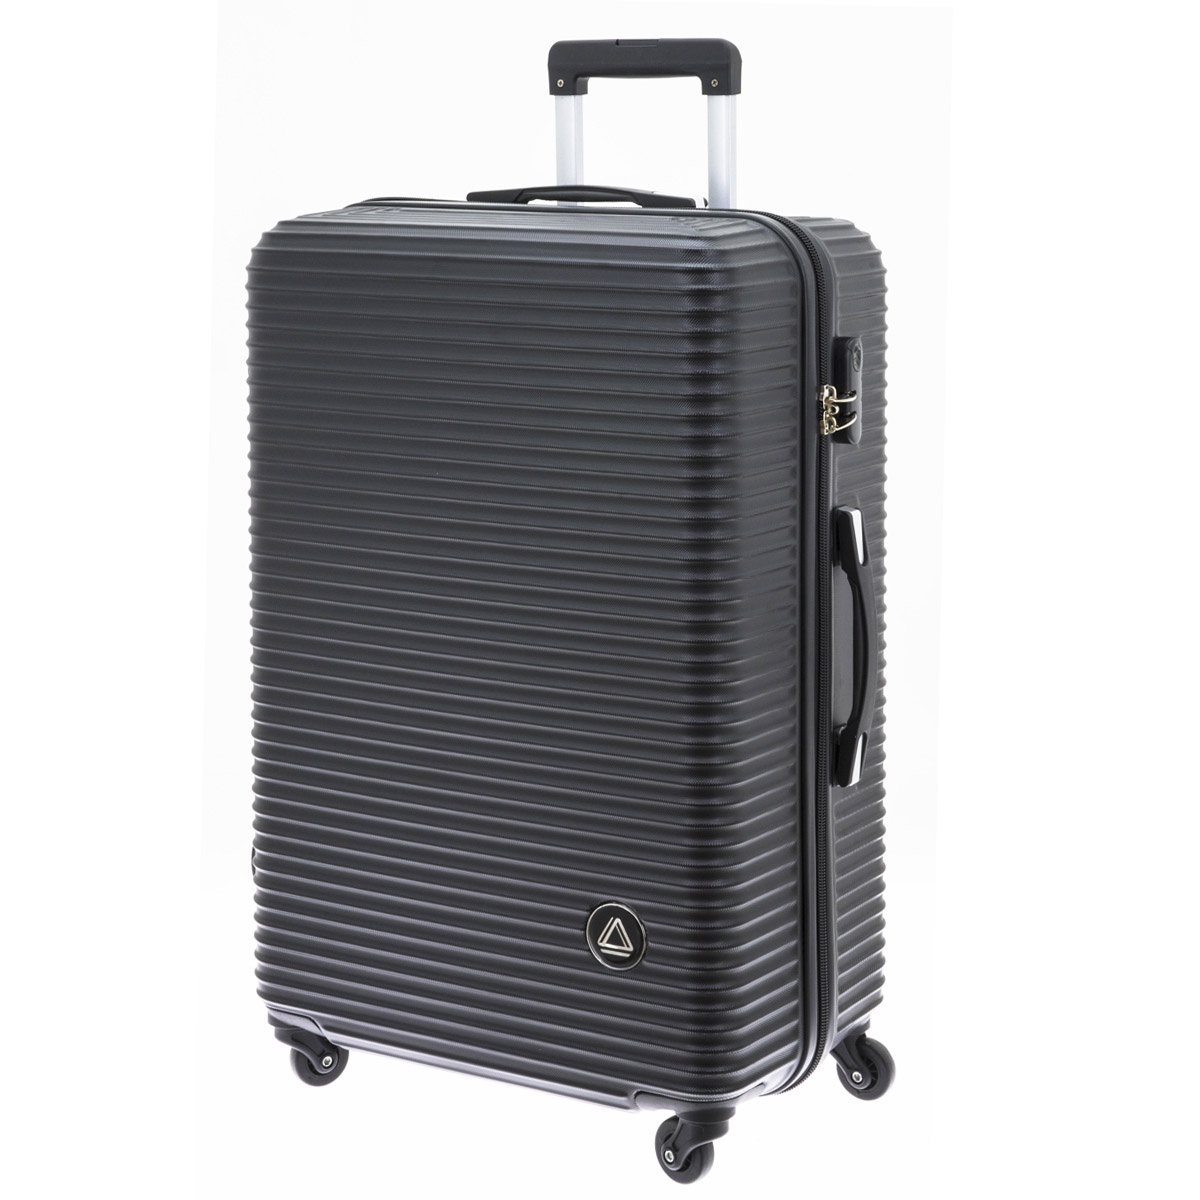 Valise trolley coque ABS \'Davidt\'s\' noir - 75x49x29 cm - [Q9932]